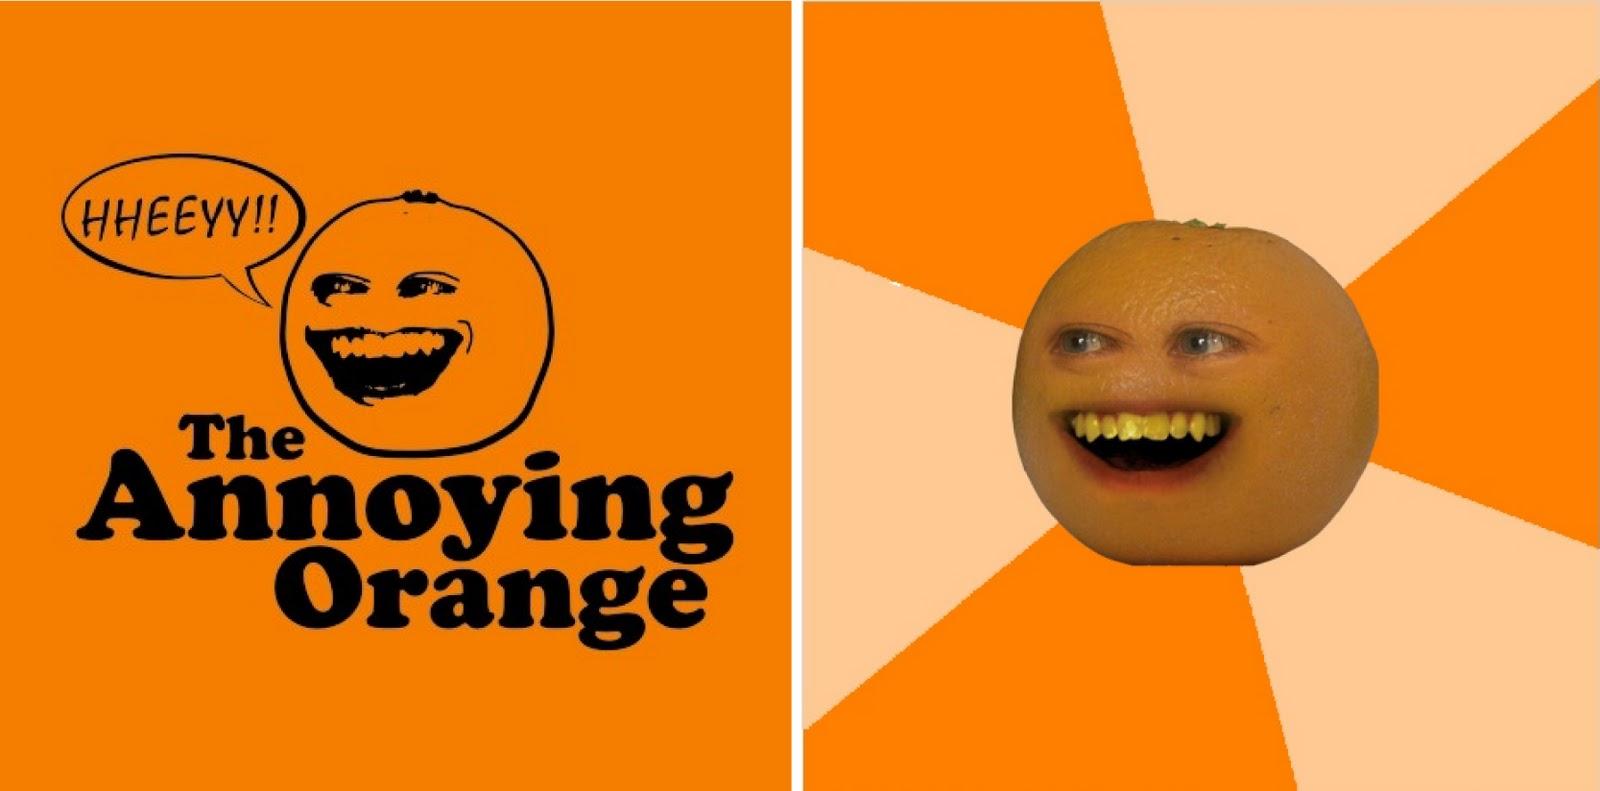 http://1.bp.blogspot.com/-y_L6aTU7Z-M/TVXqFmksQFI/AAAAAAAAAkY/_m9GFxVEUiU/s1600/Annoying+Orange4-04.jpg